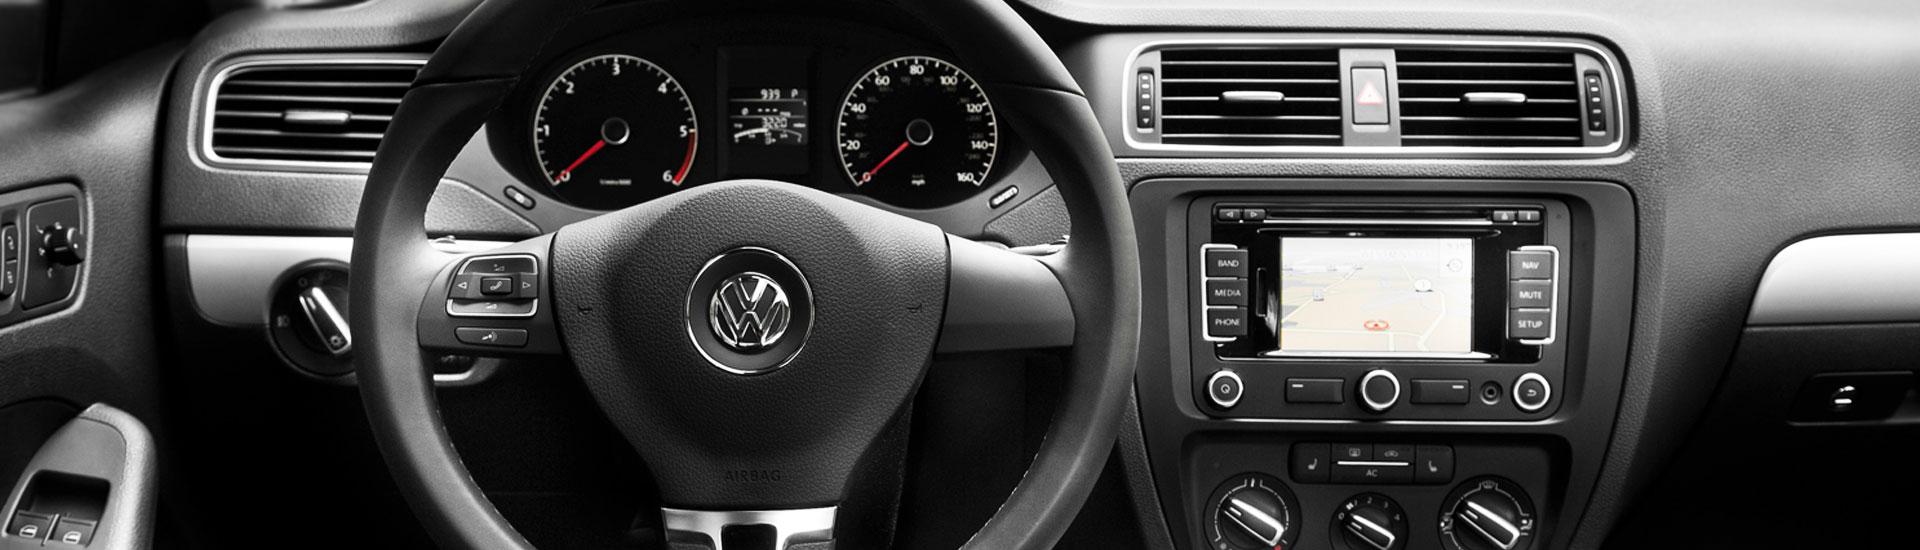 Volkswagen Jetta Custom Dash Kits